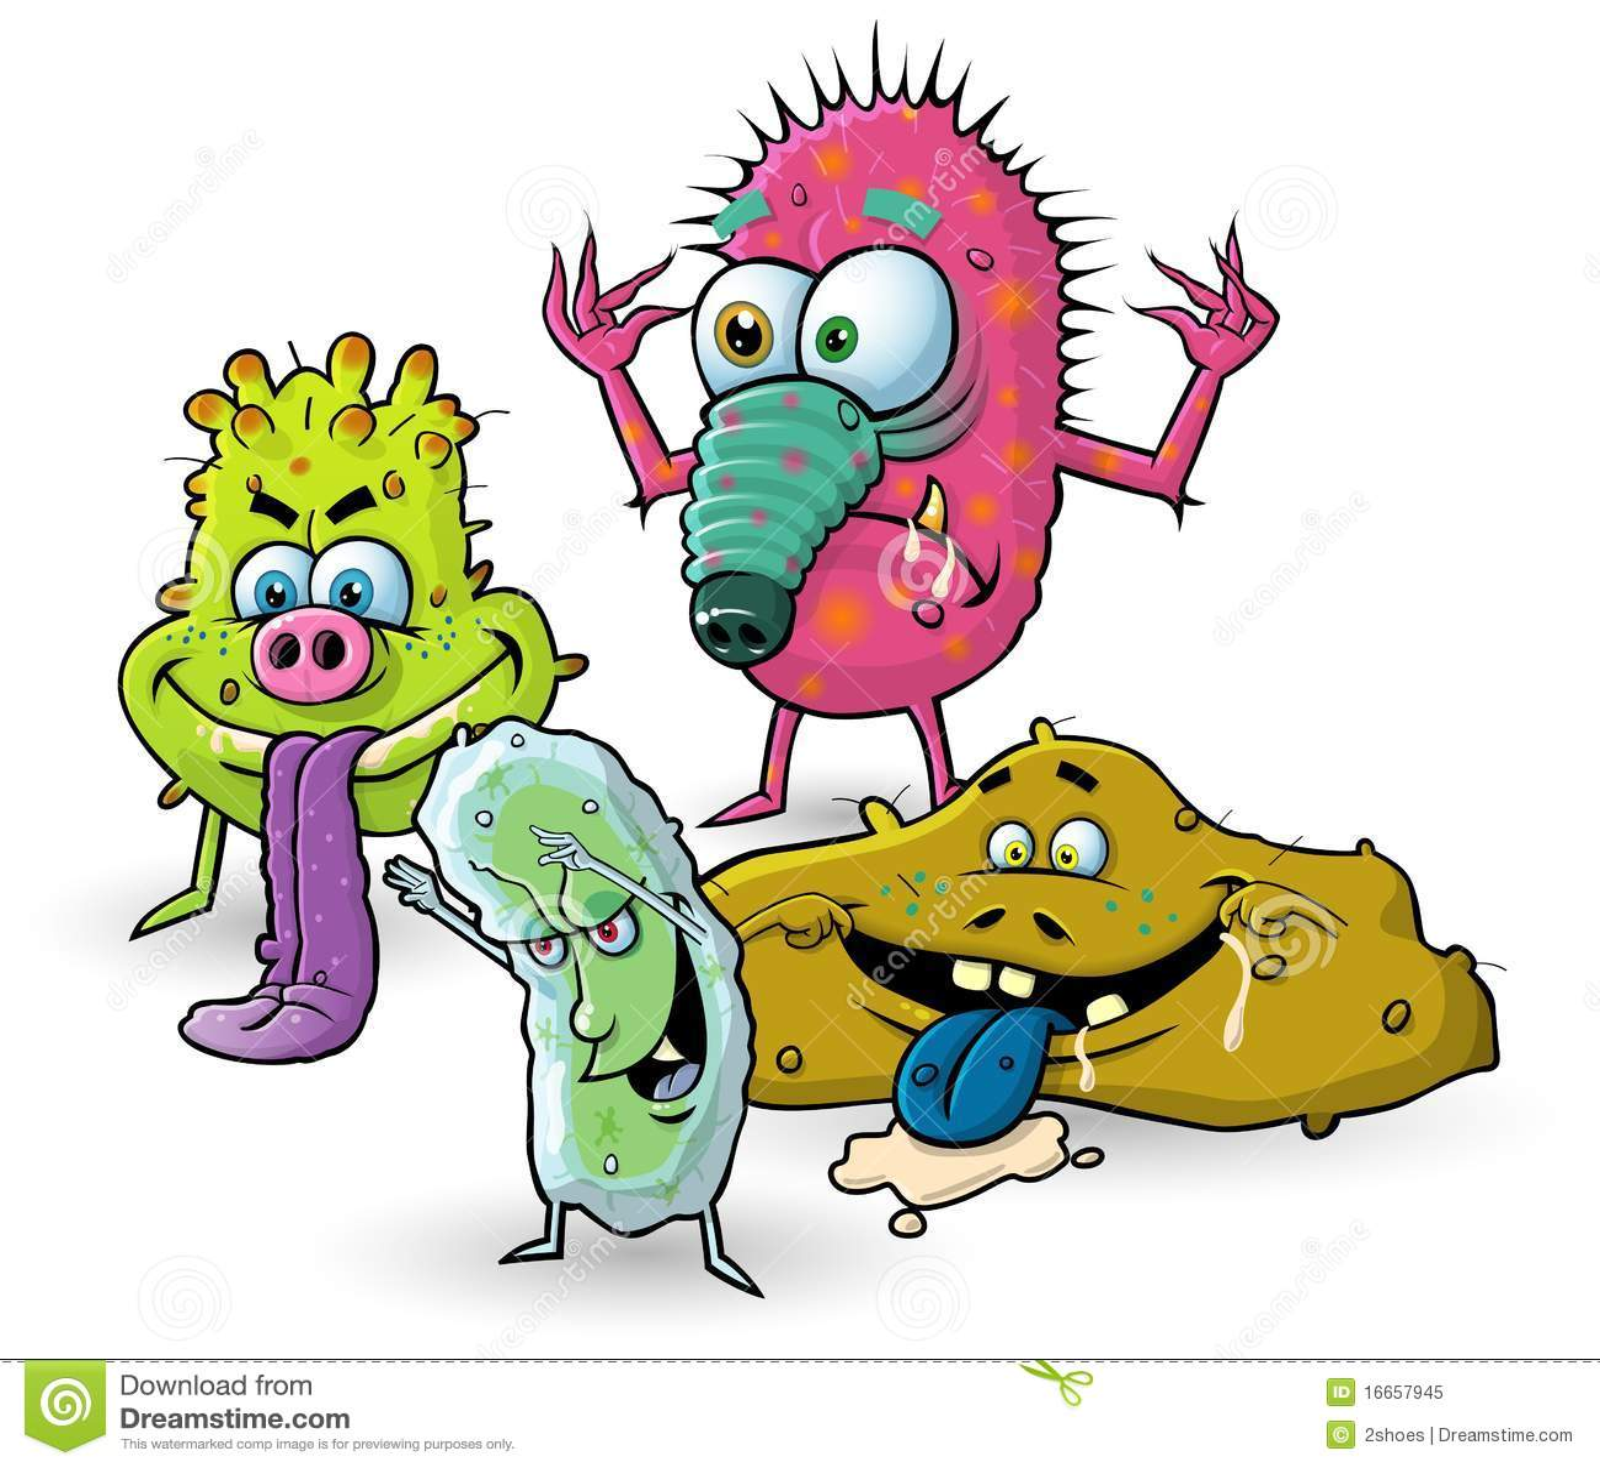 Foto de stock royalty free germes dos desenhos animados vírus